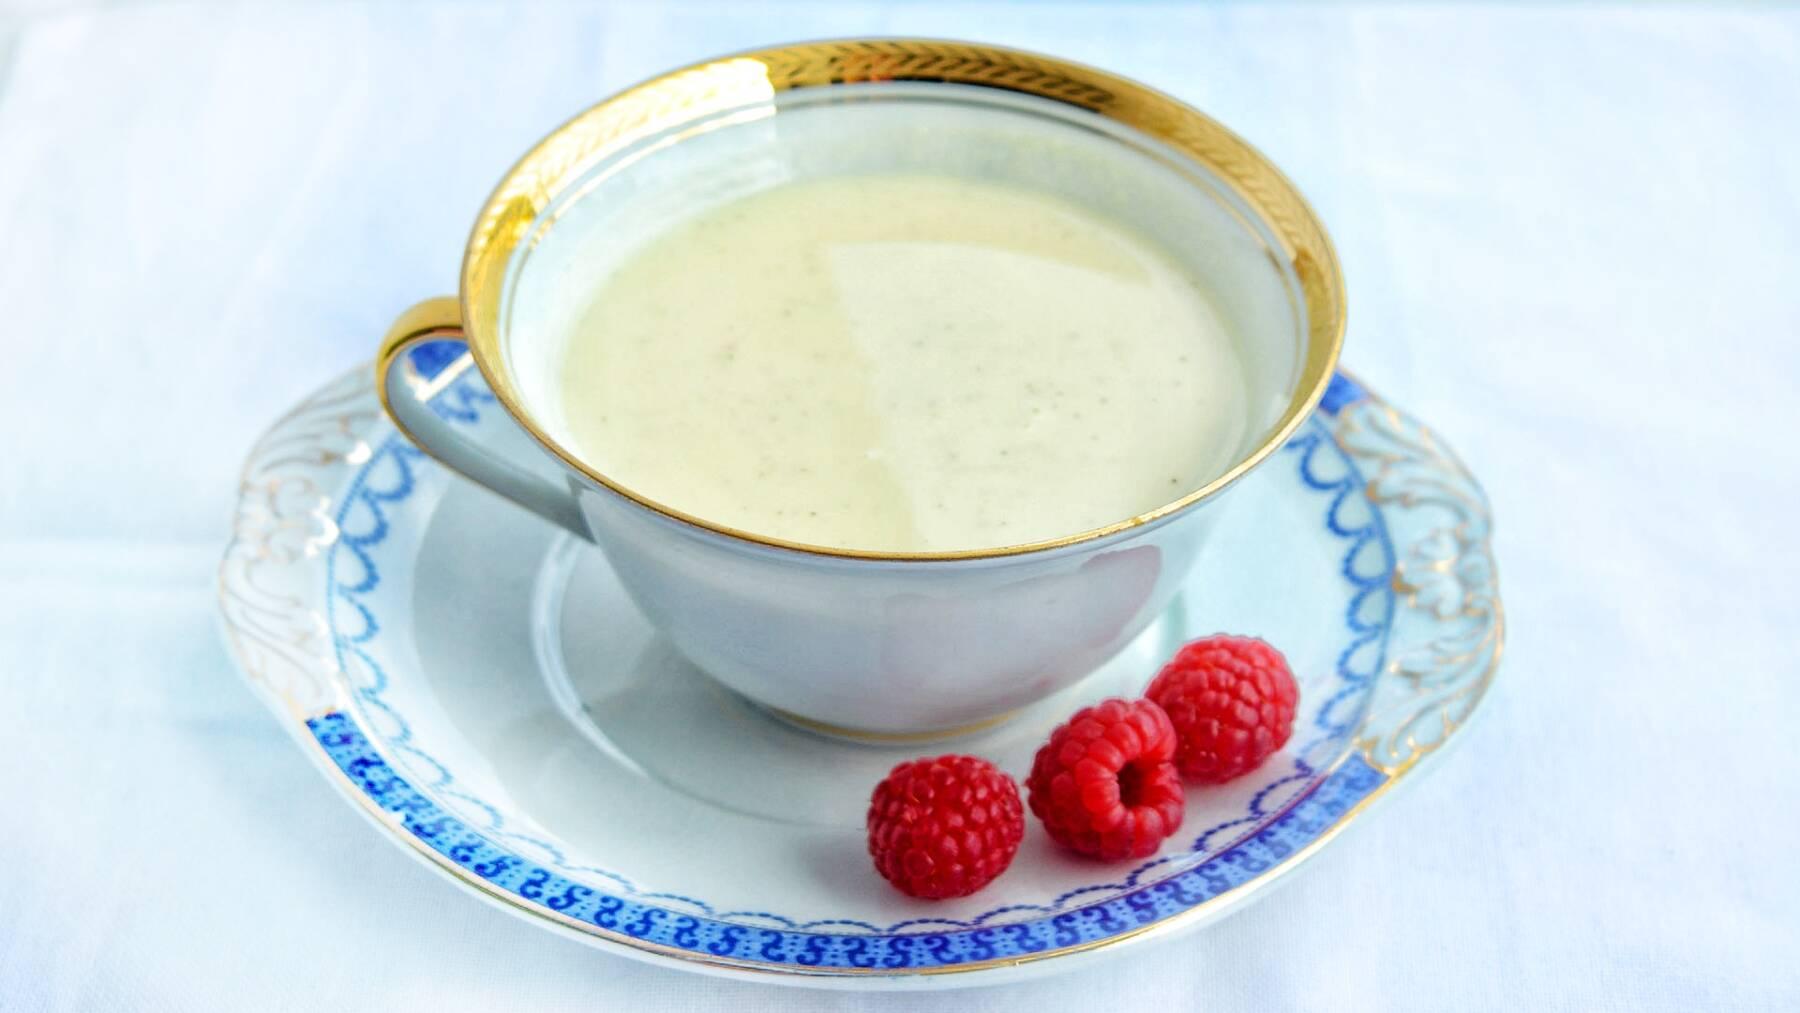 ricetta facile crema inglese per bavarese